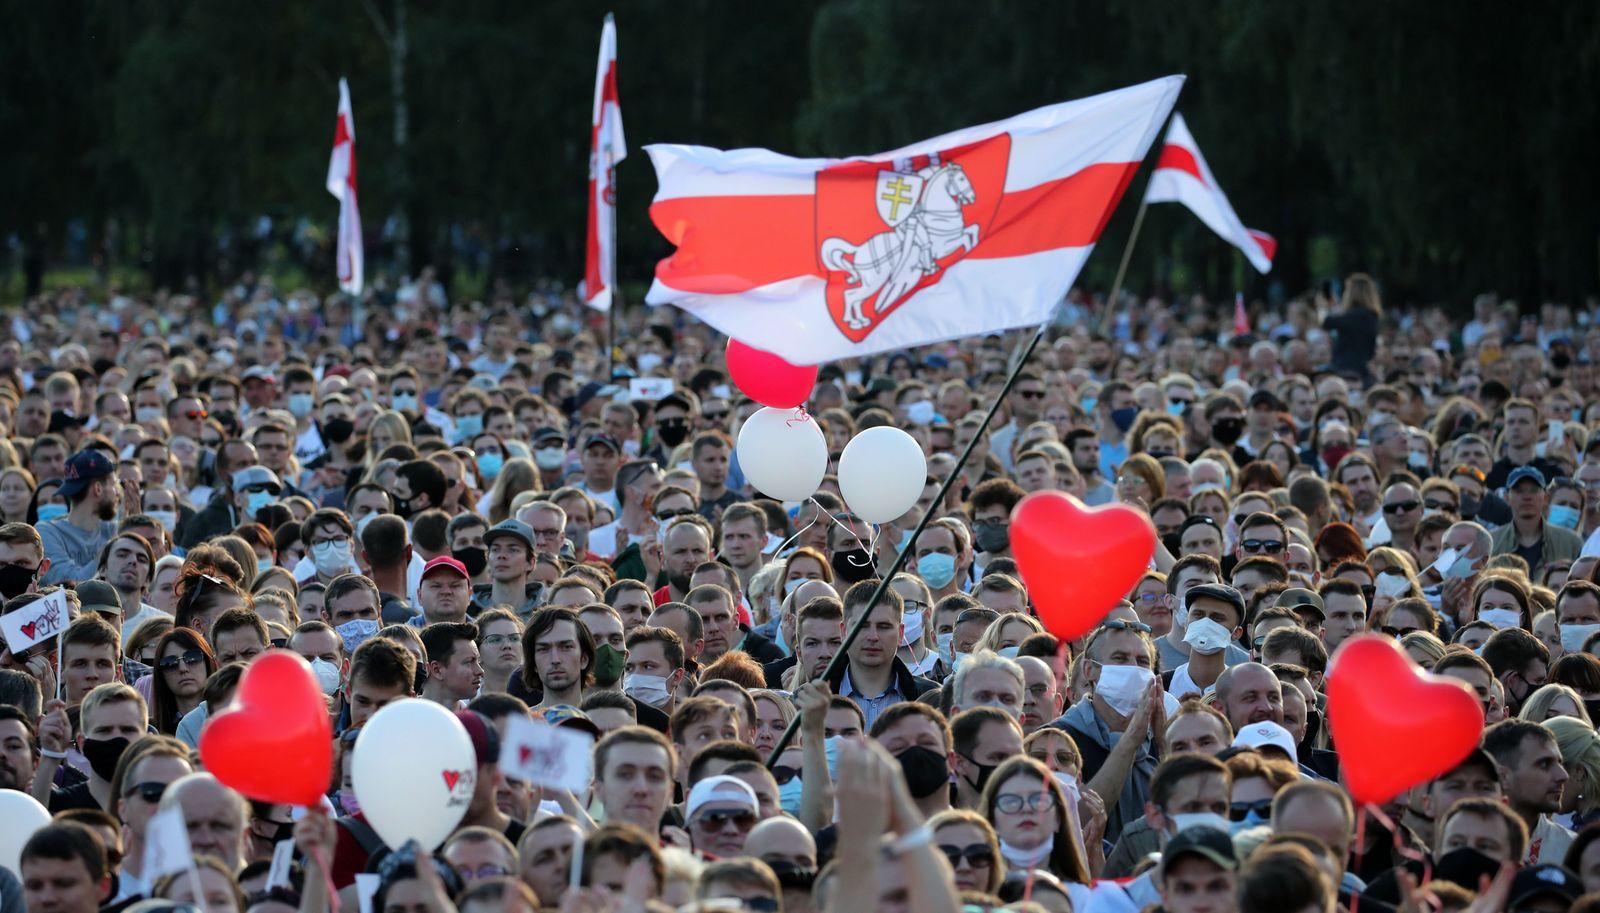 Belarusian presidential candidate Svetlana Tikhanovskaya holds campaign rally in Minsk, Belarus - 30 Jul 2020